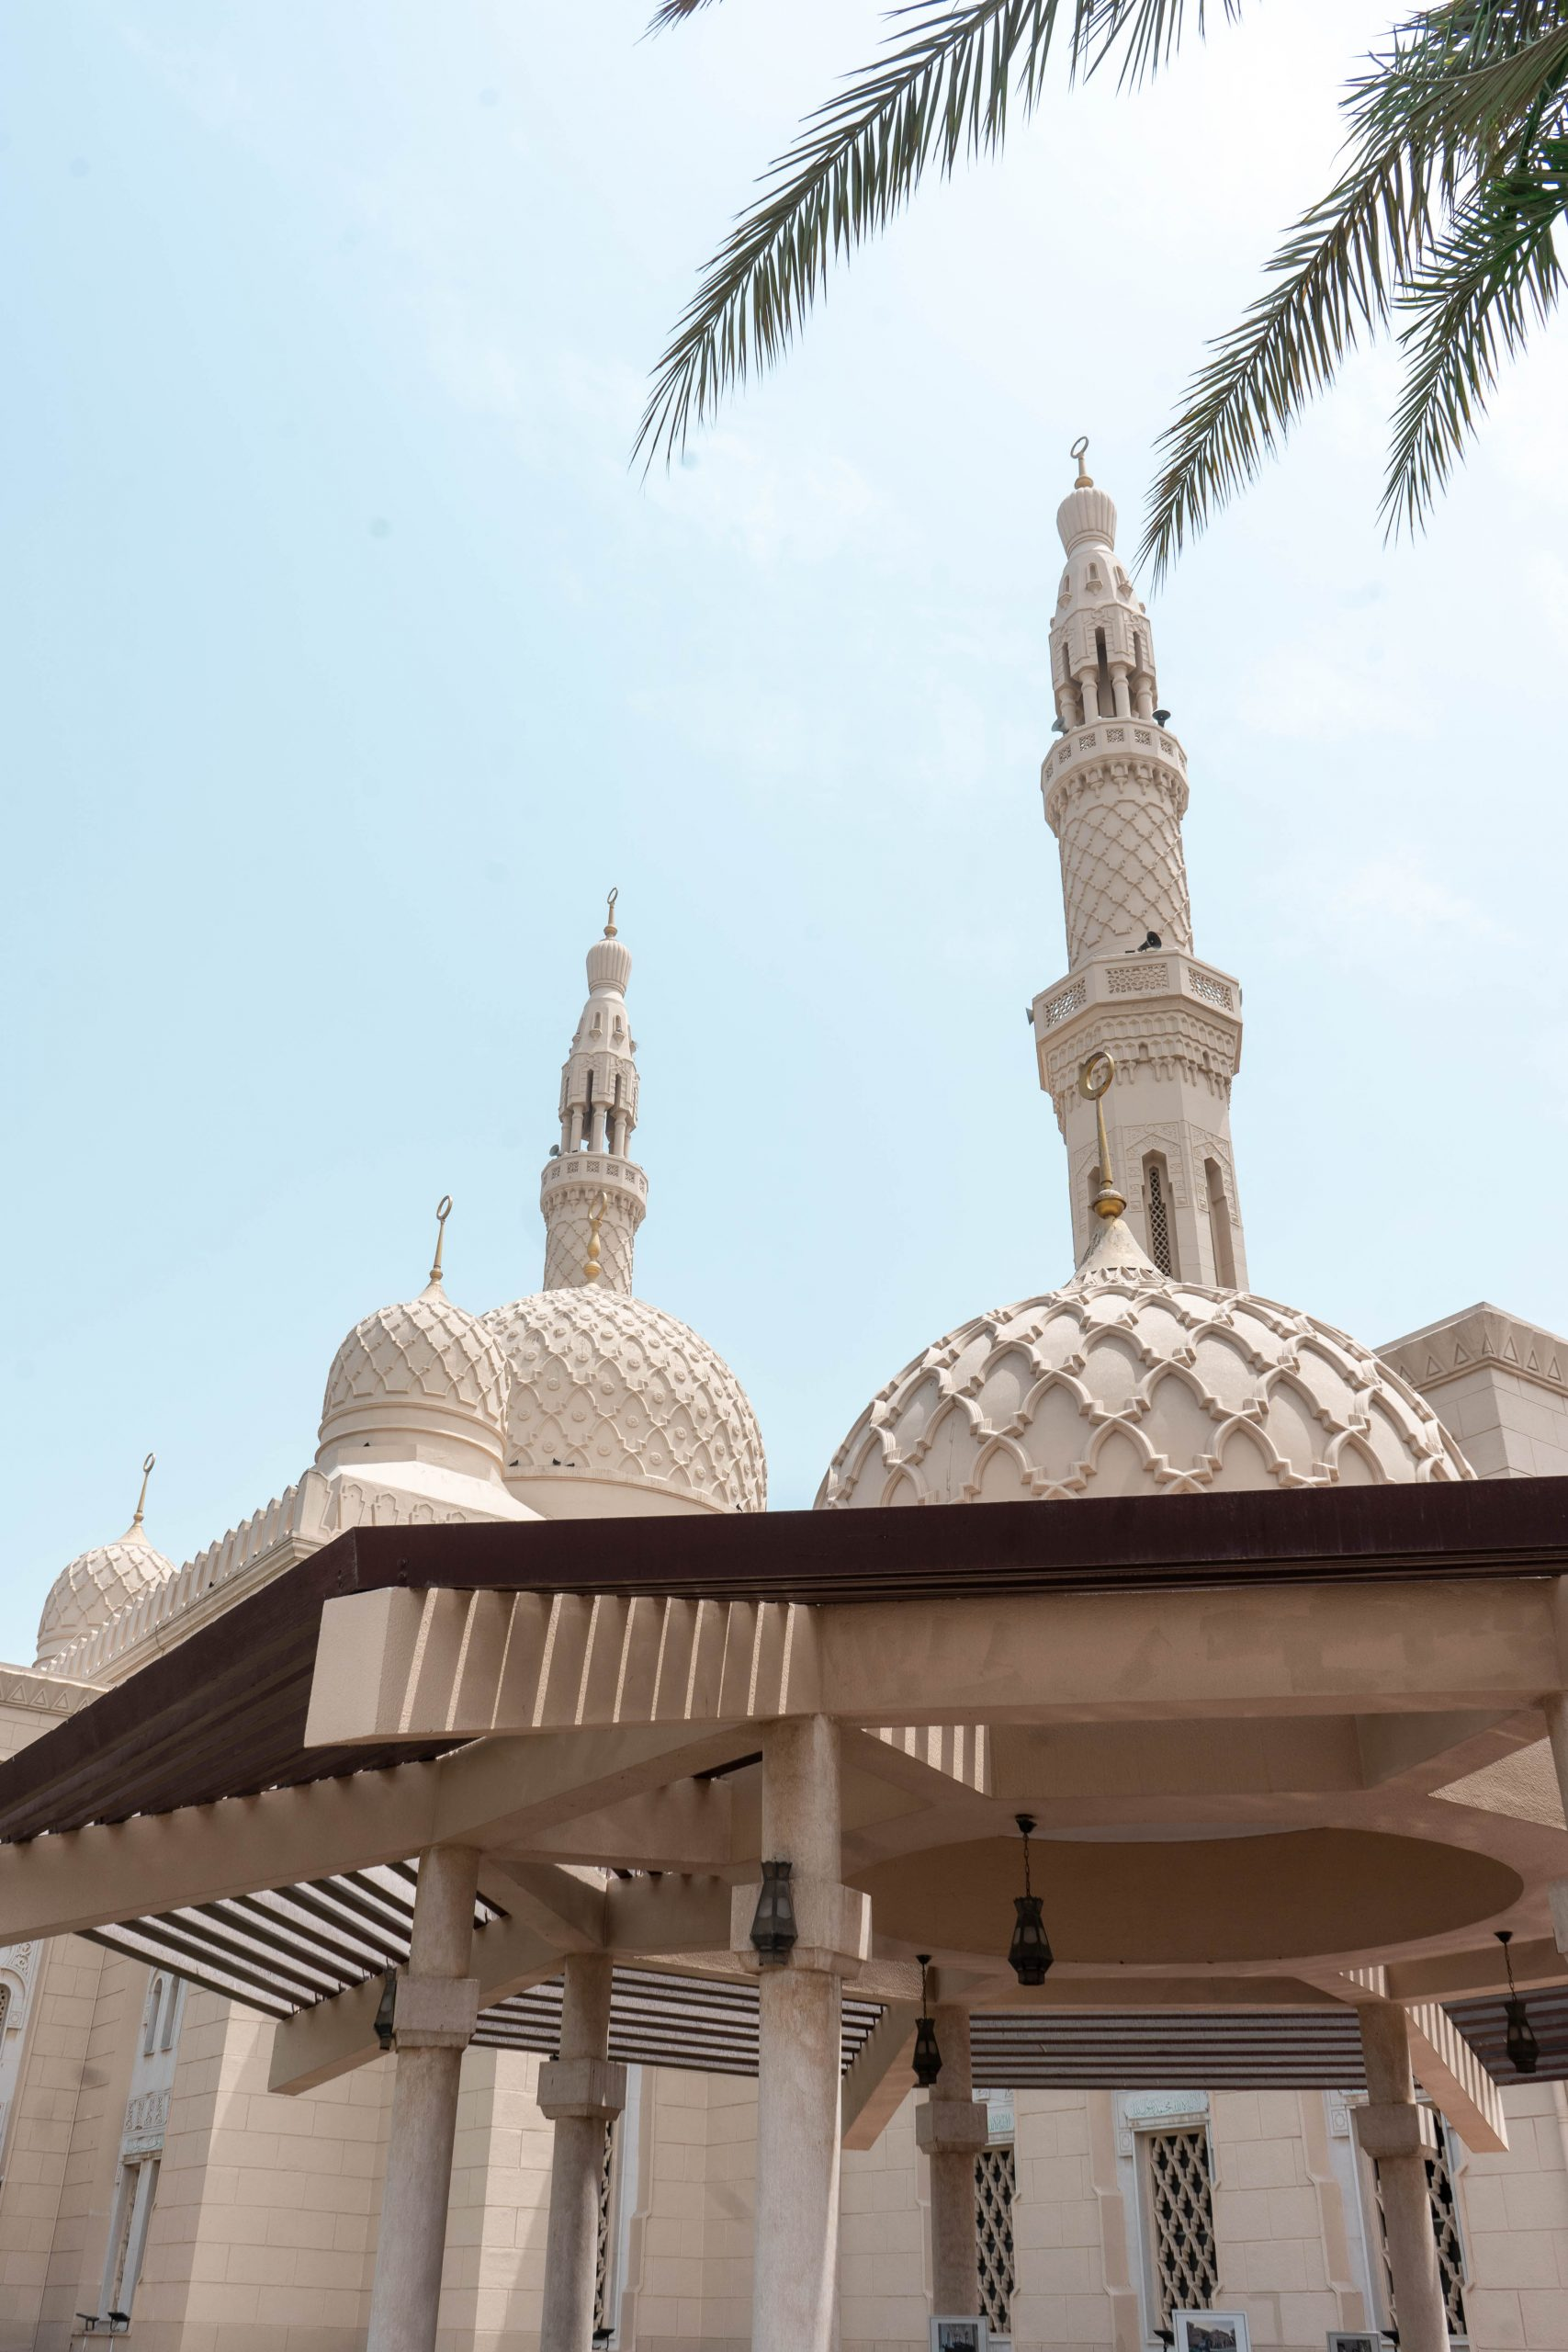 jumeirah mosque fatimid architecture dubai uae united arab emirates masjid entrance